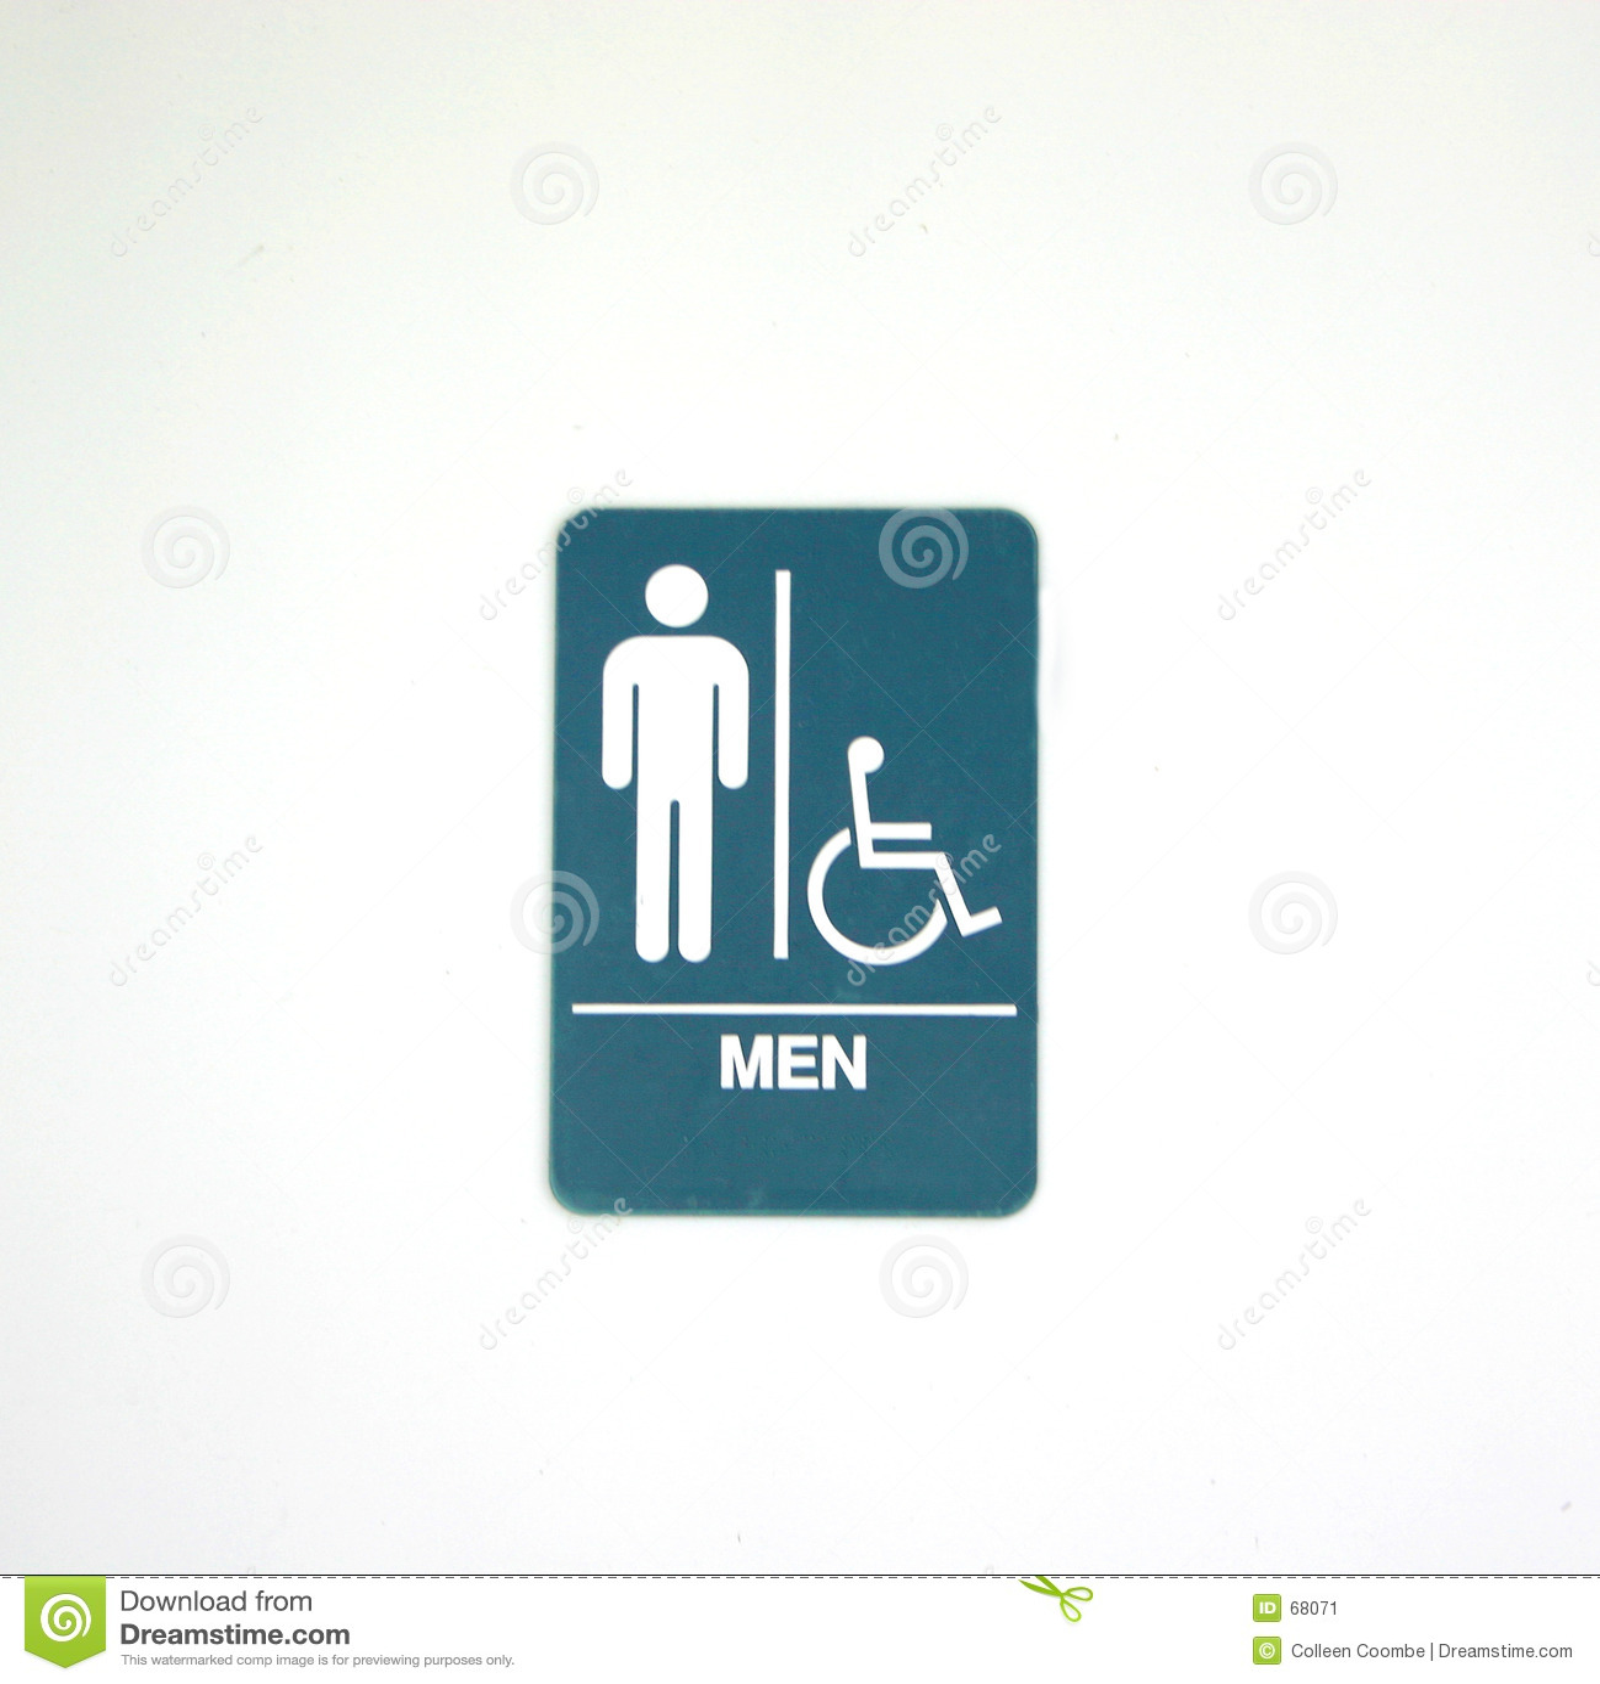 Symbol for mens room stock image image of white blue 68071 symbol for men s room biocorpaavc